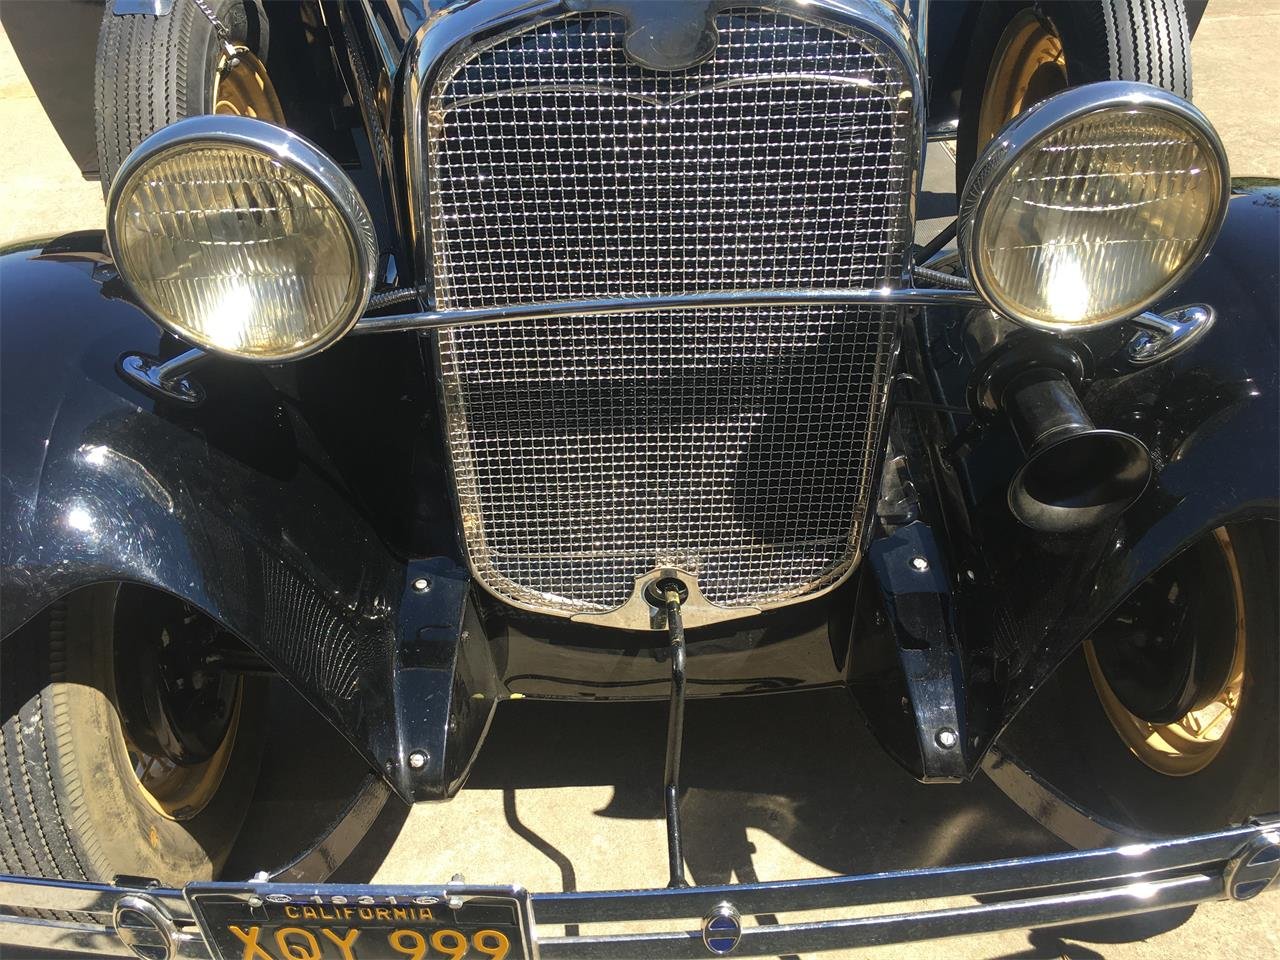 Large Picture of Classic '31 Ford Model A located in Sacramento California - $35,000.00 - L8BU